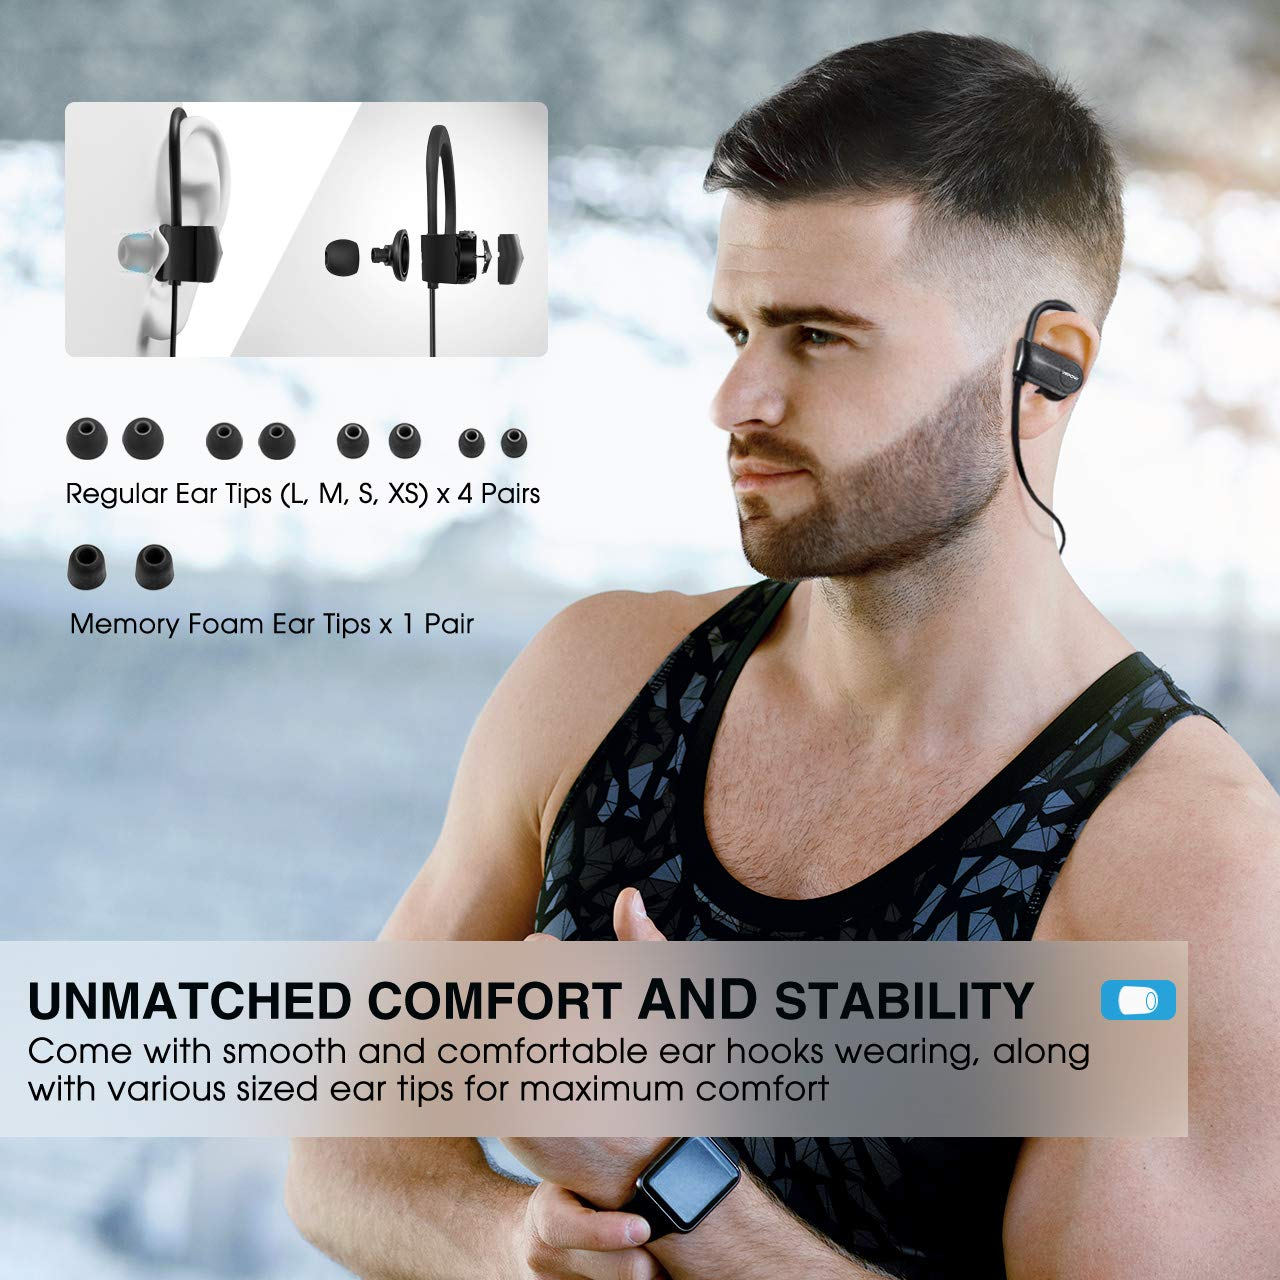 Mpow D7 Bluetooth Headphones Sport, 10H Playtime & IPX7 Waterproof Wireless Headphones Sport Earbuds W/Bass Stereo Sound, Running Headphones Bluetooth Earphones W/CVC 6.0 Noise Cancelling Mic, Black by Mpow (Image #6)